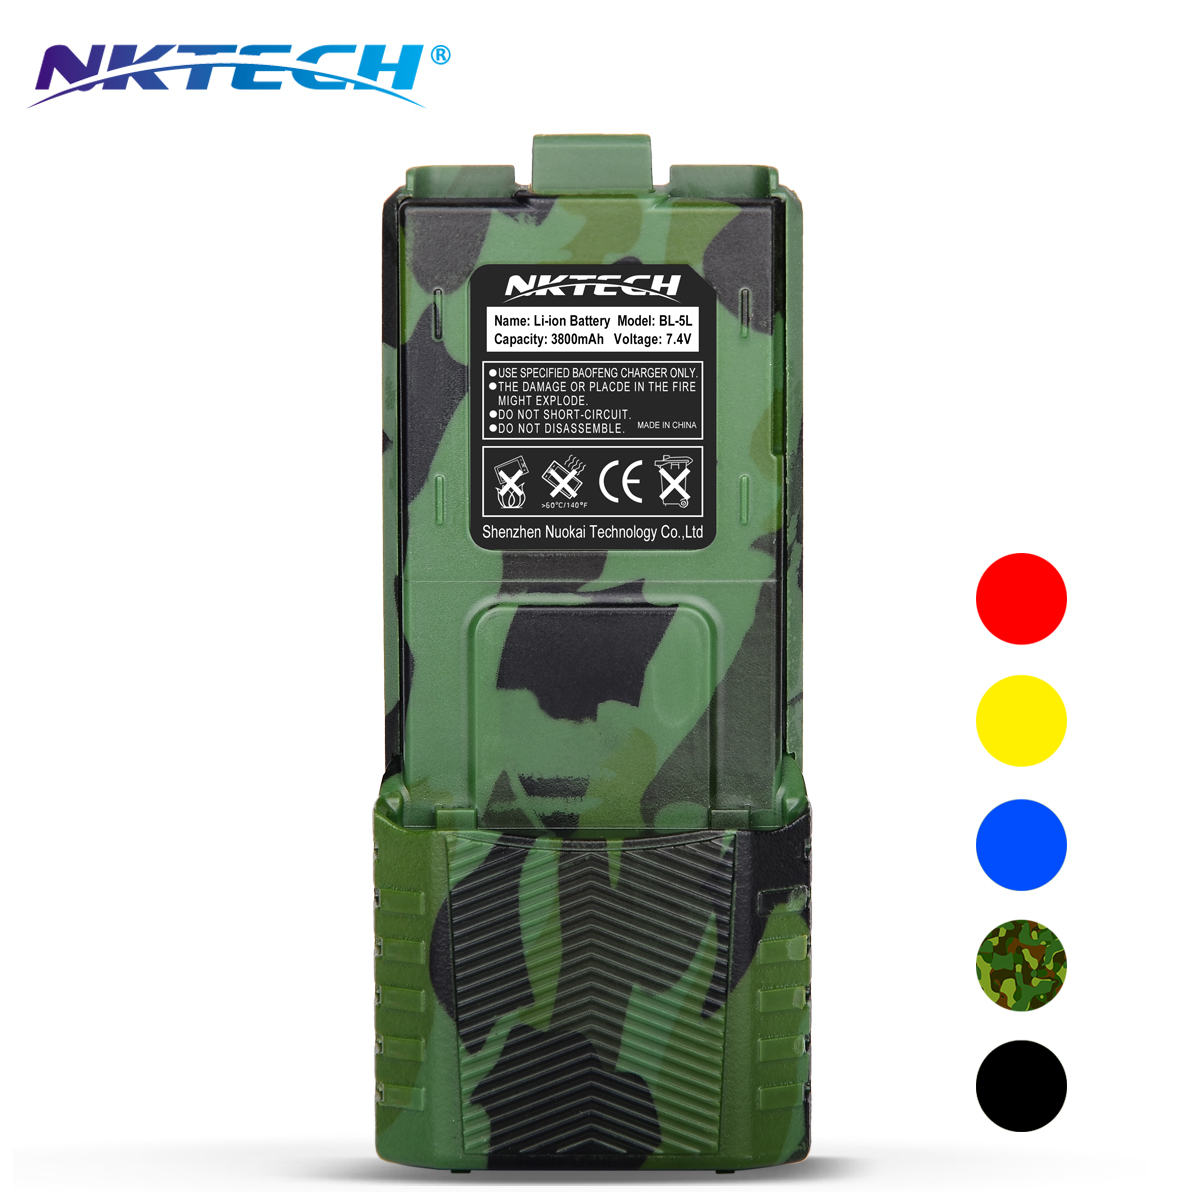 NKTECH Talkie Walkie Étendu BL-5L 3800 mAh 7.4 V Li-ion Batterie Pour BaoFeng UV-5R PLUS DM-5R BF-F8HP UV-5RTP UV-5RE TYT TH-F8